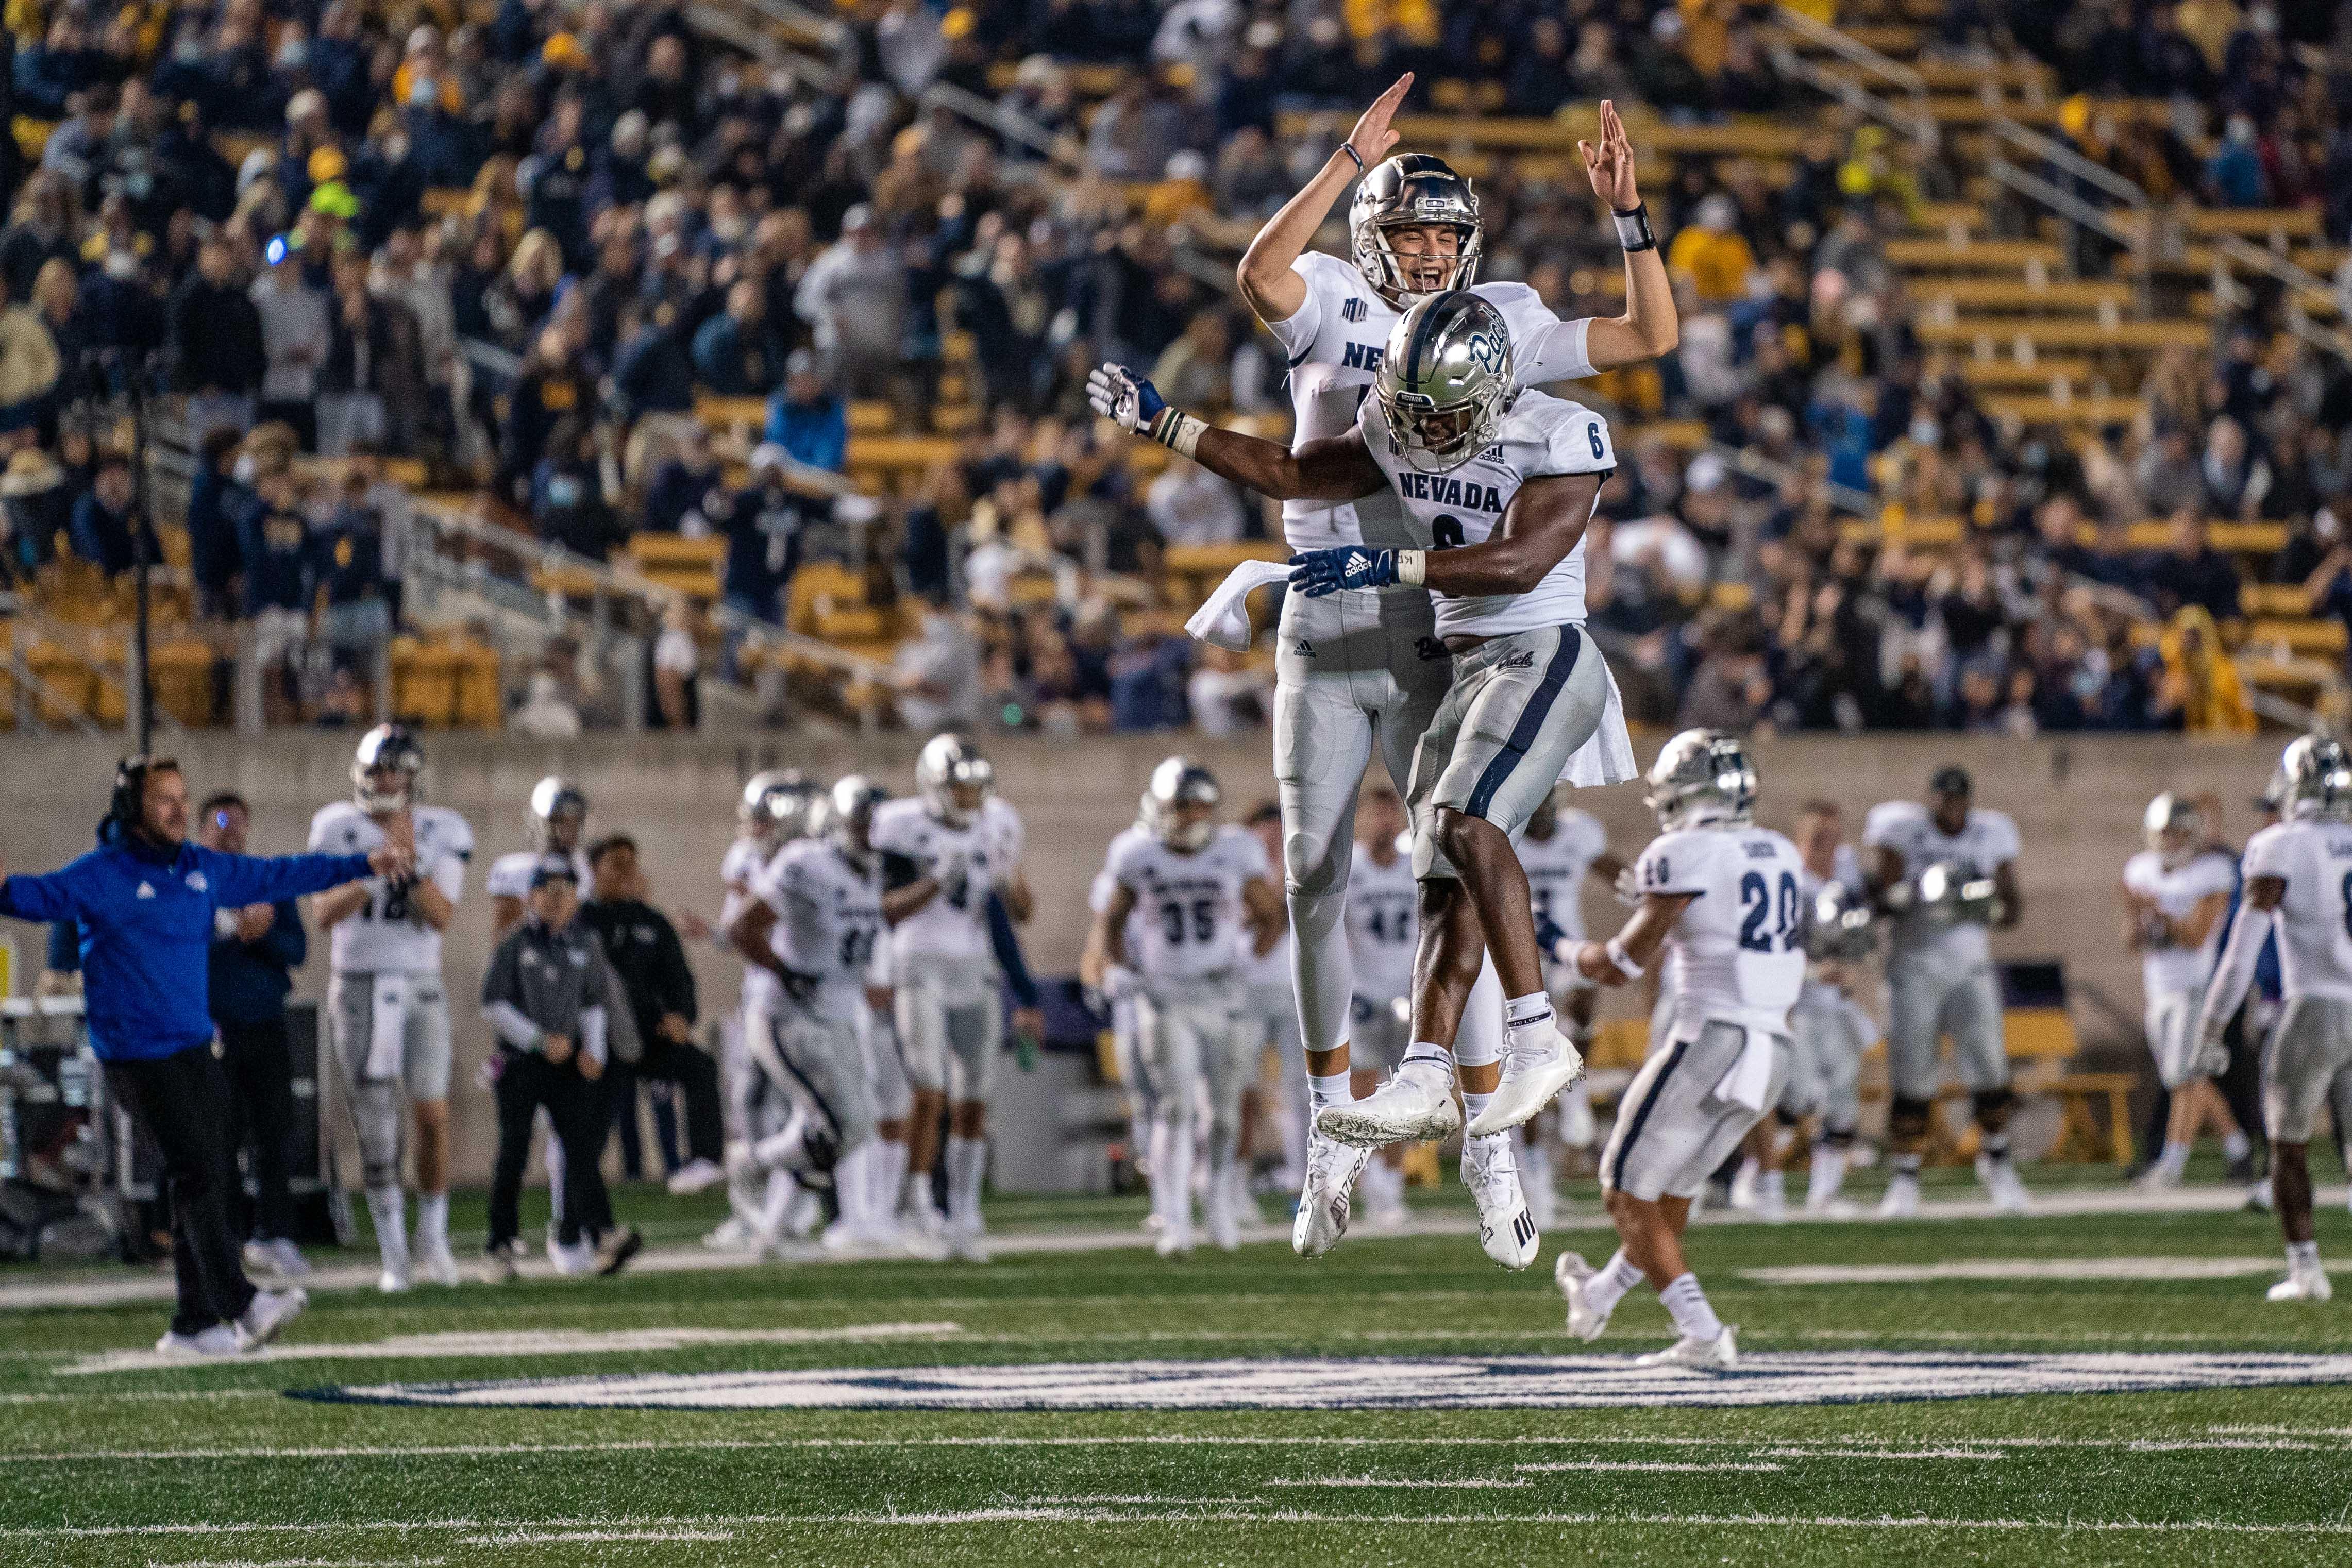 NCAA Football: Nevada at California